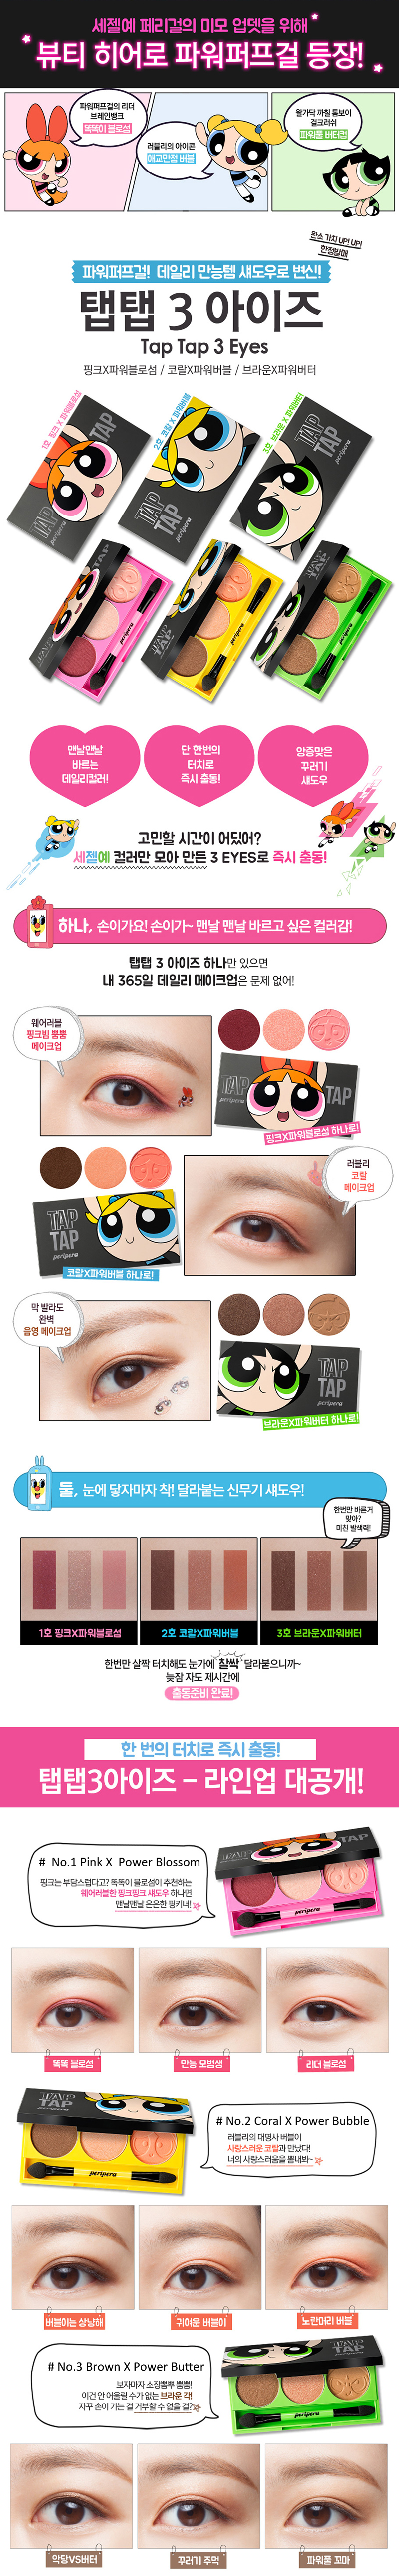 peripera-tap-tap-3-eyes-powerpuff-girls-1.jpg